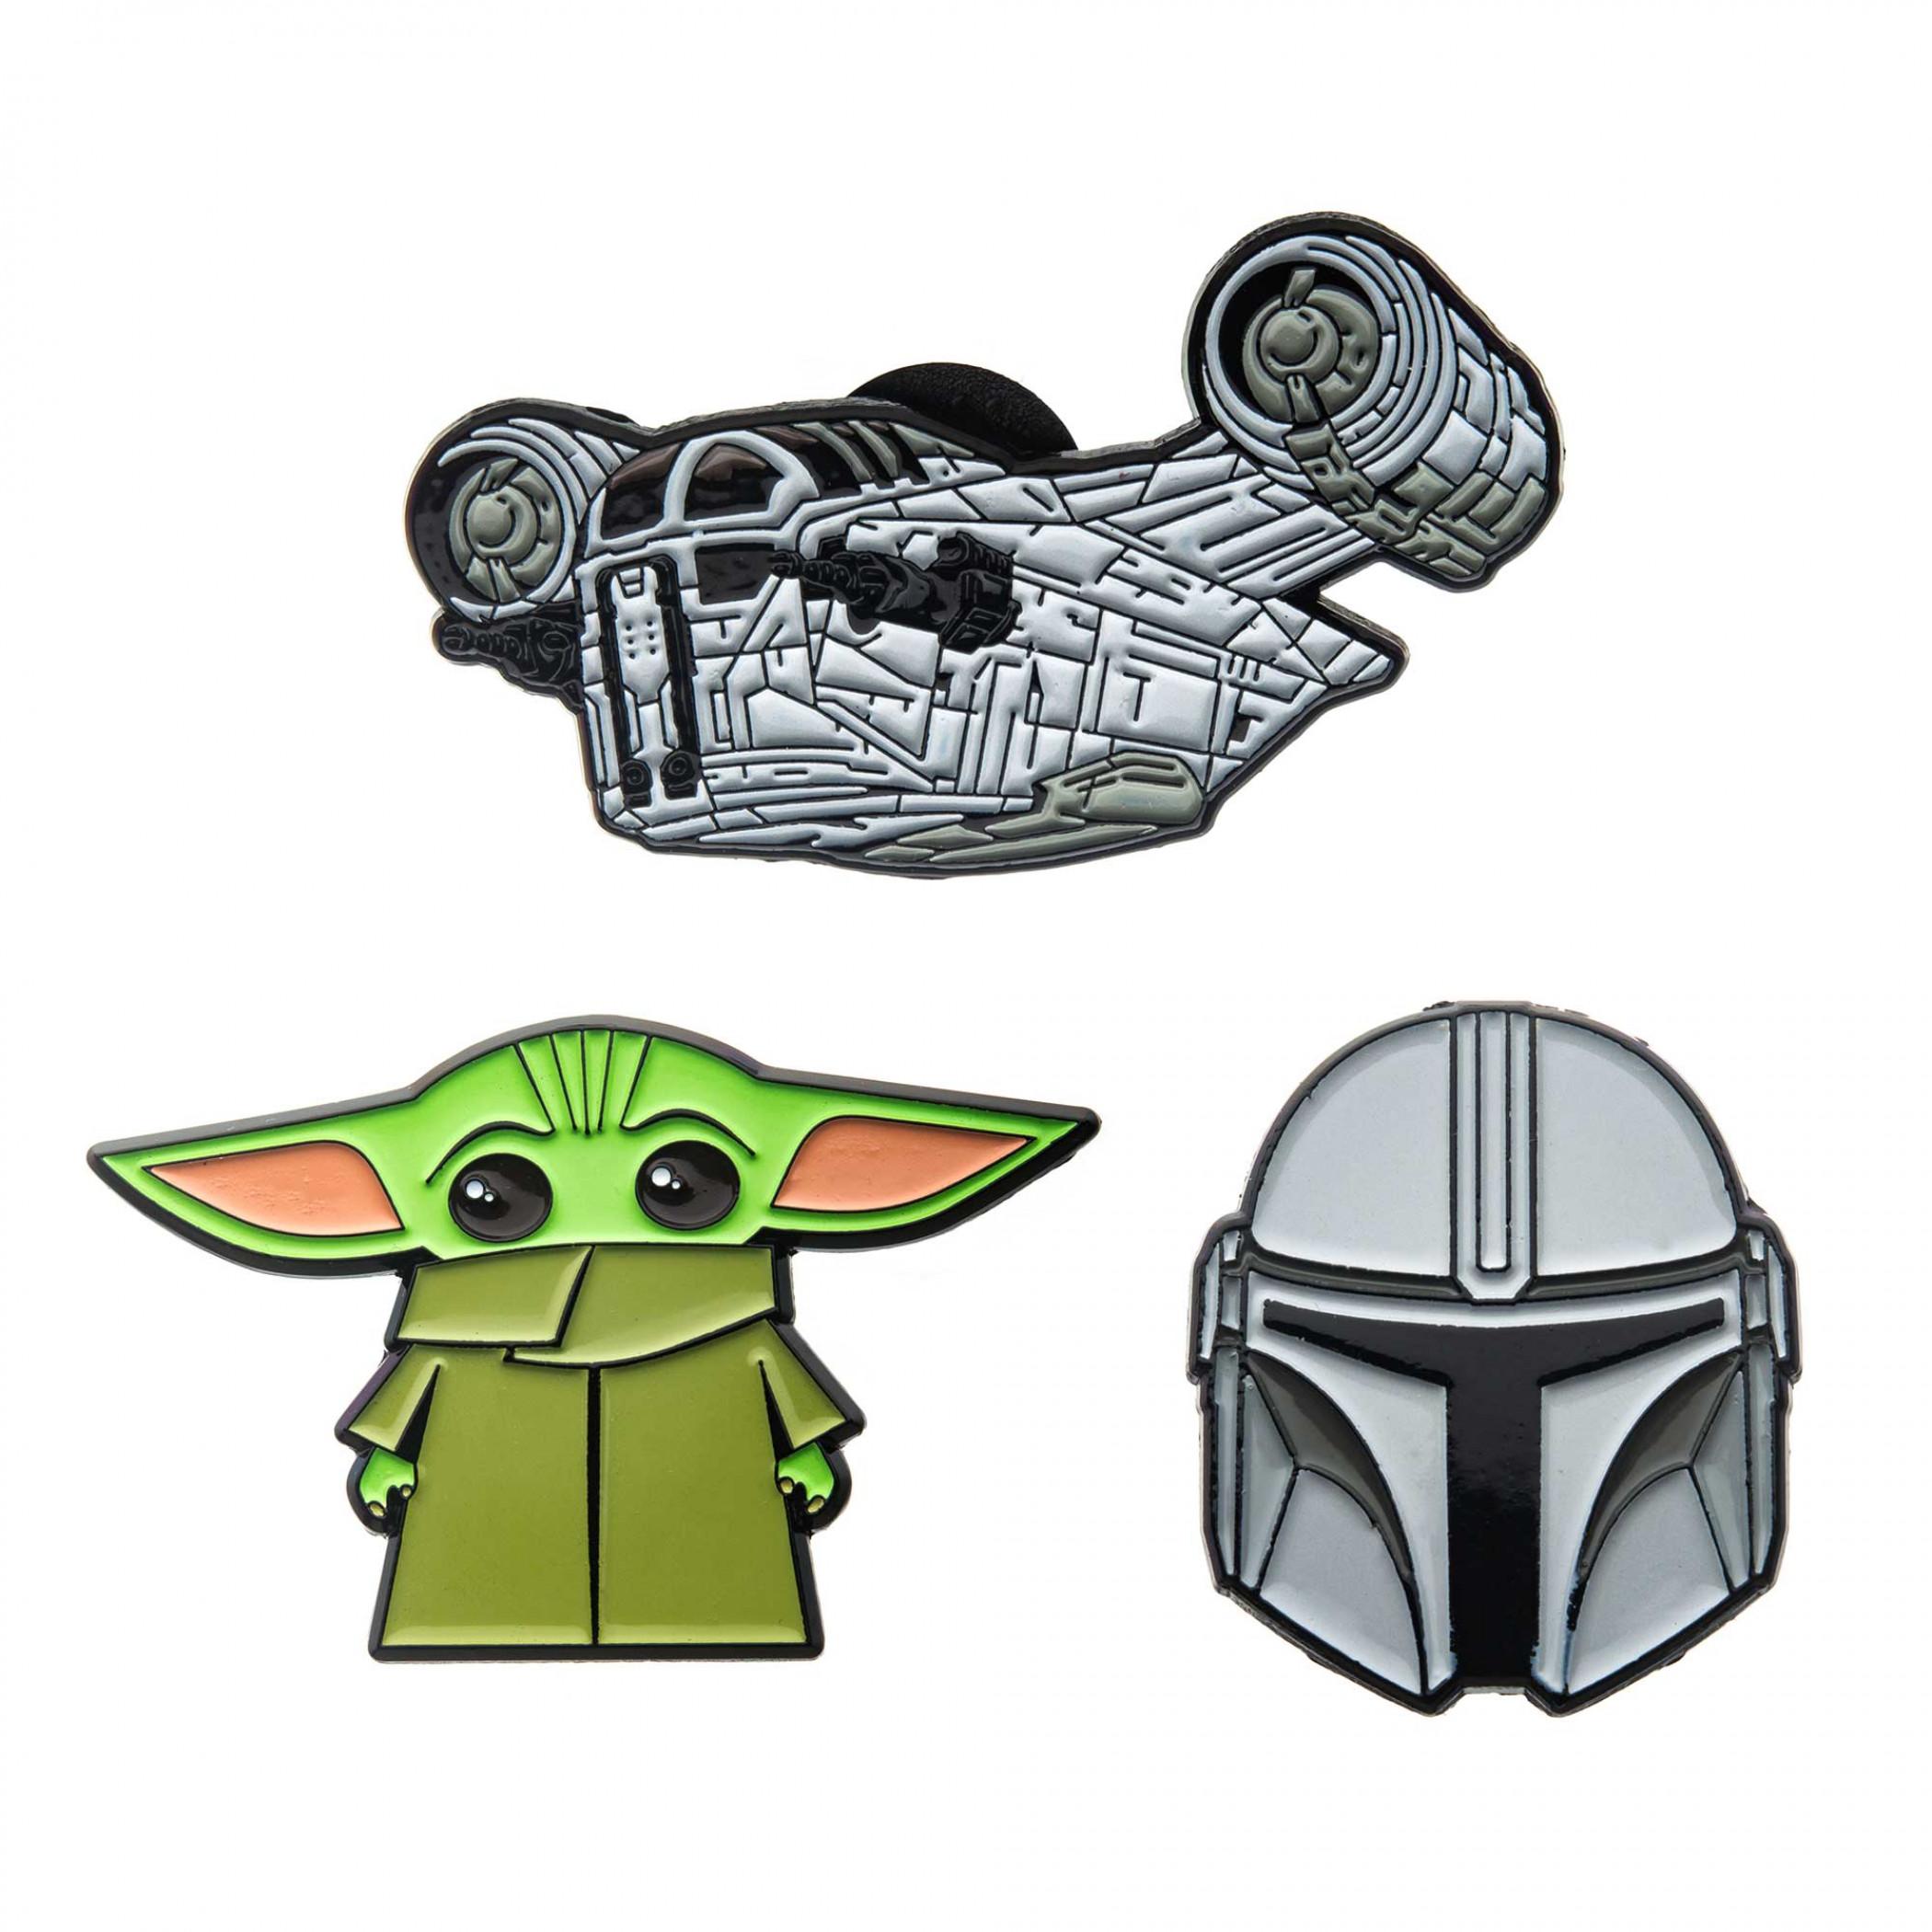 Star Wars The Mandalorian and The Child Enamel Pin Set